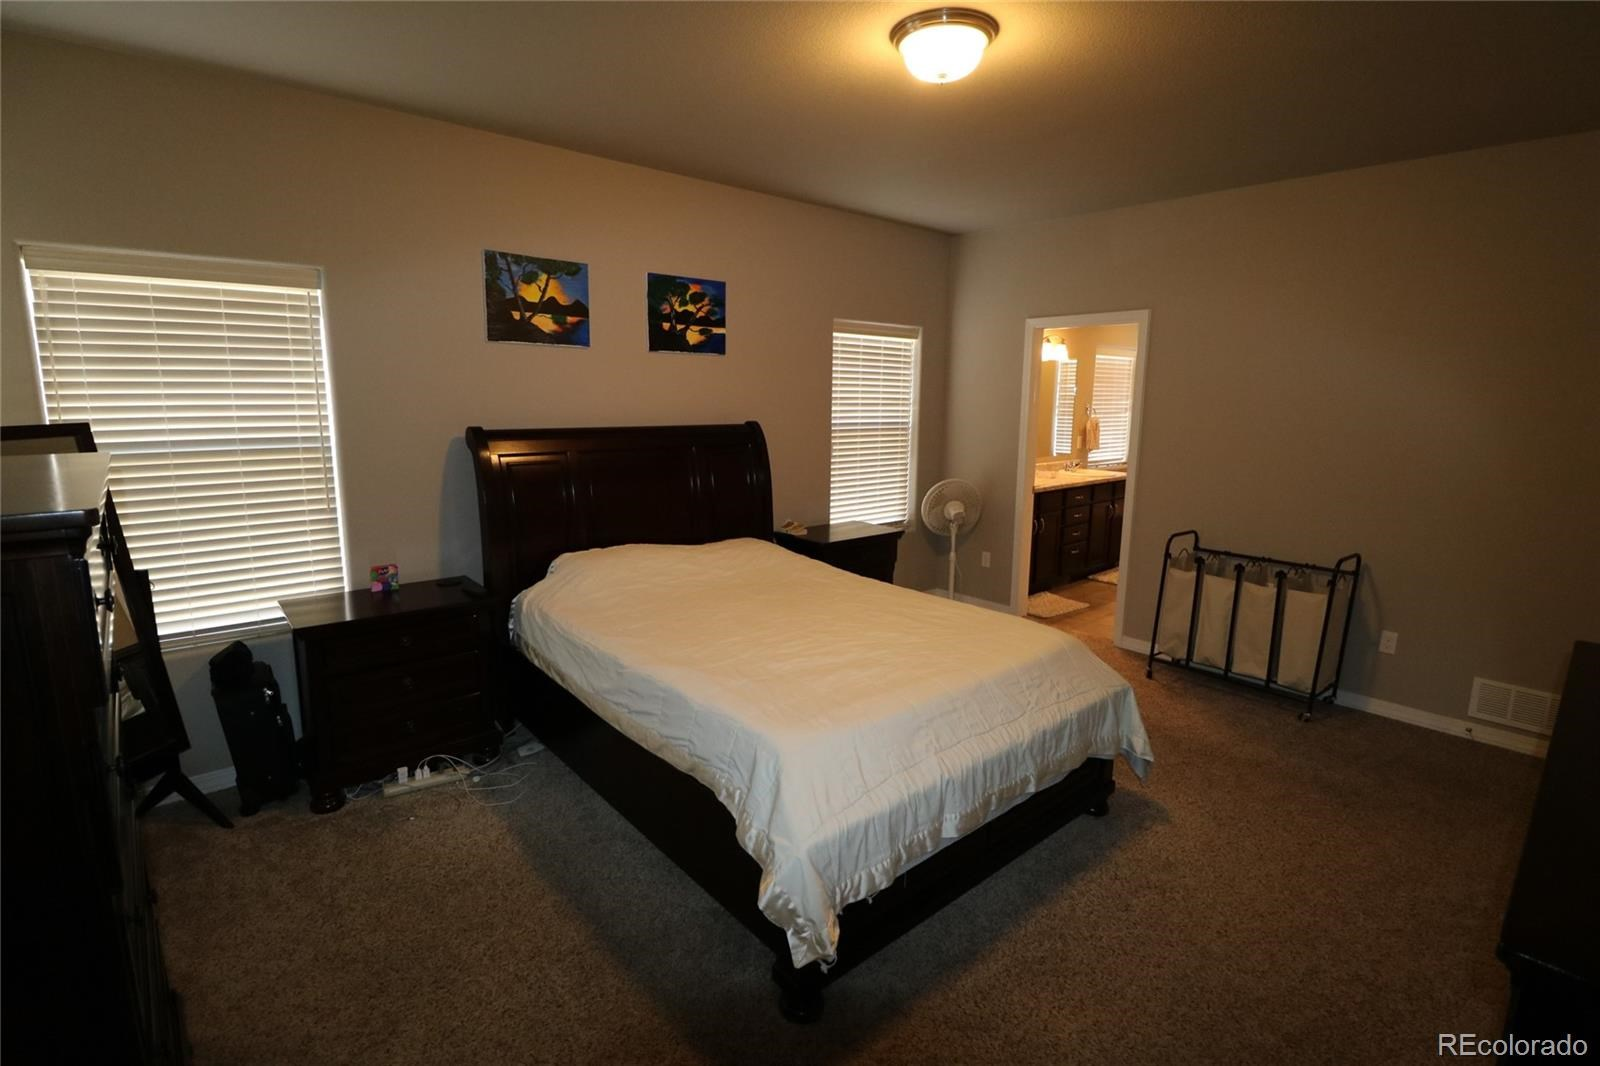 MLS# 4464685 - 15 - 10827 Hidden Prairie Parkway, Fountain, CO 80817